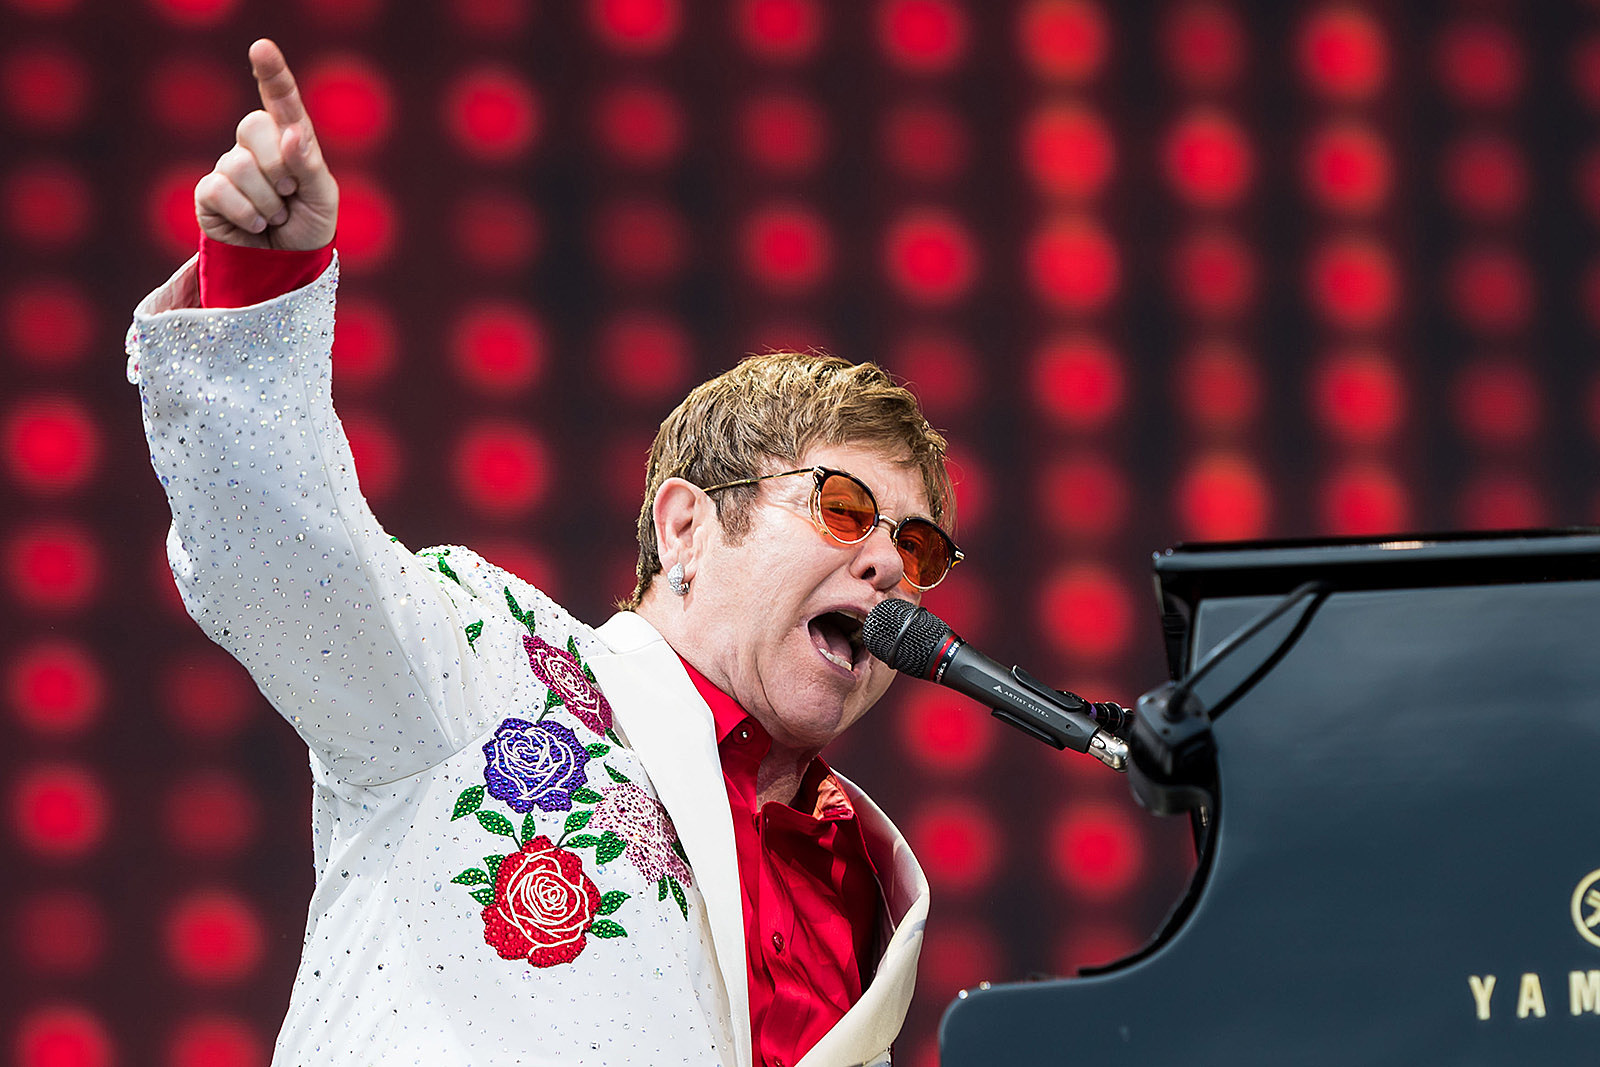 Elton John Says He Likes Being 'Normal' but 'Grander'